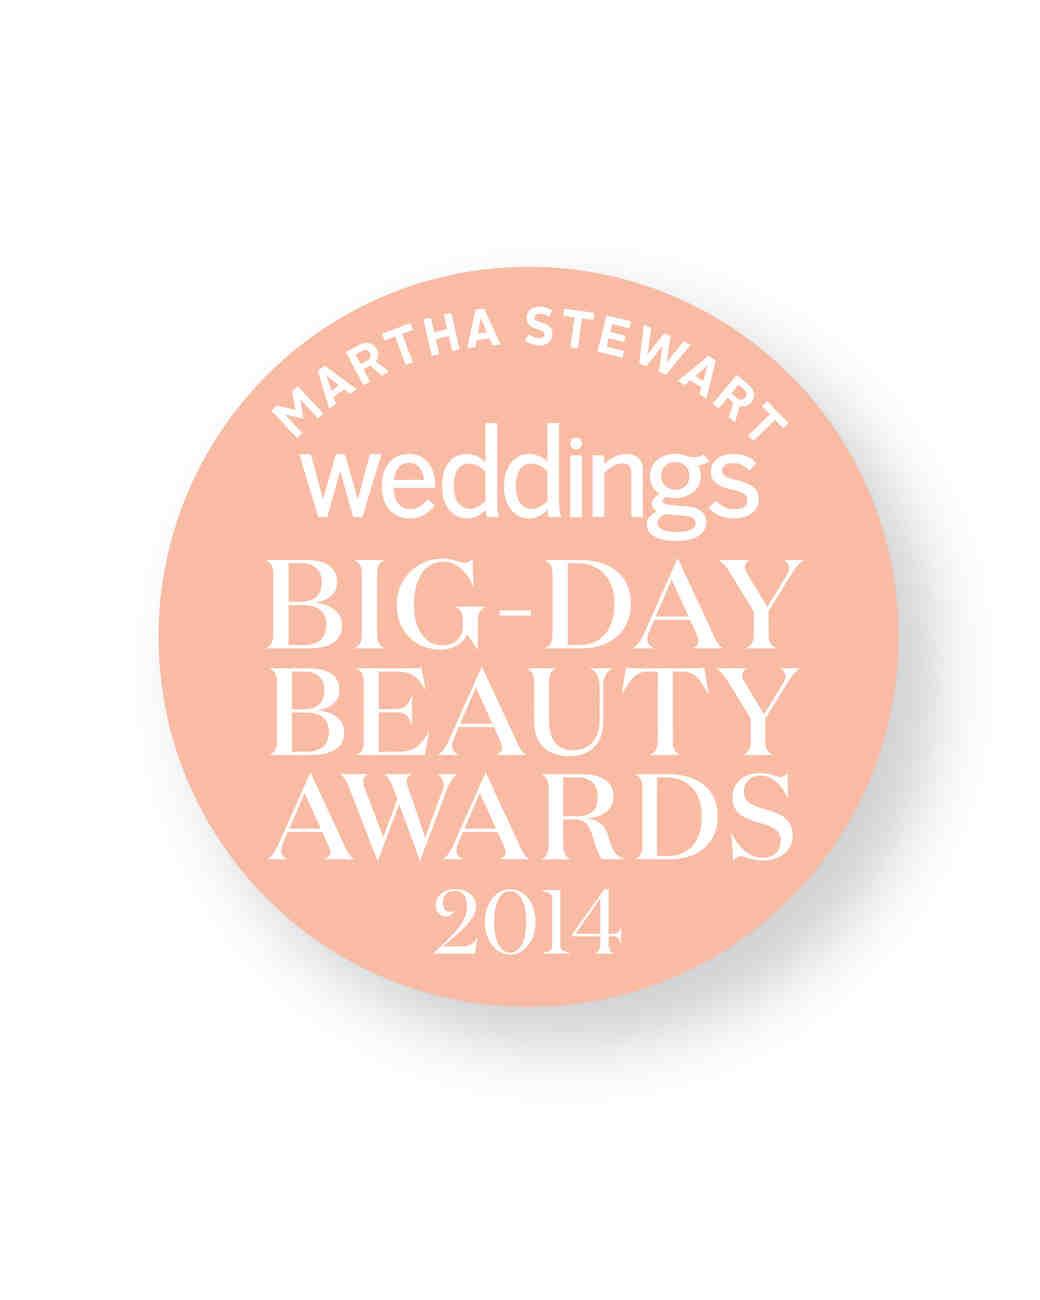 big-day-beauty-awards-large-2014.jpg